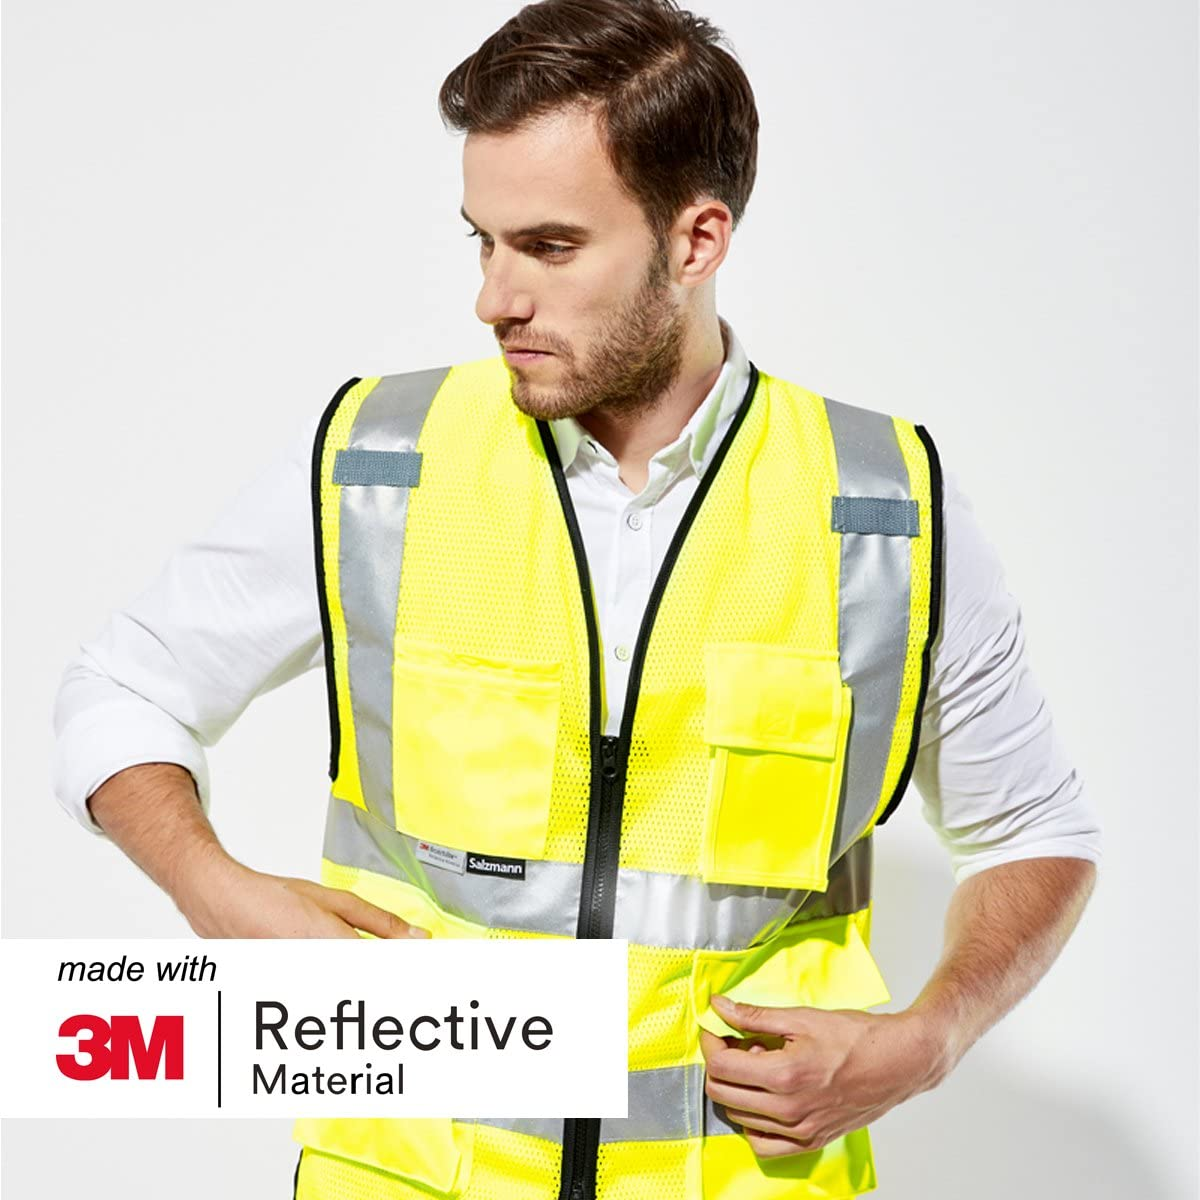 Salzmann 3M High Visibility Multi Pocket Vest made with 3M Reflective Tape Highly Breathable Mesh Vest